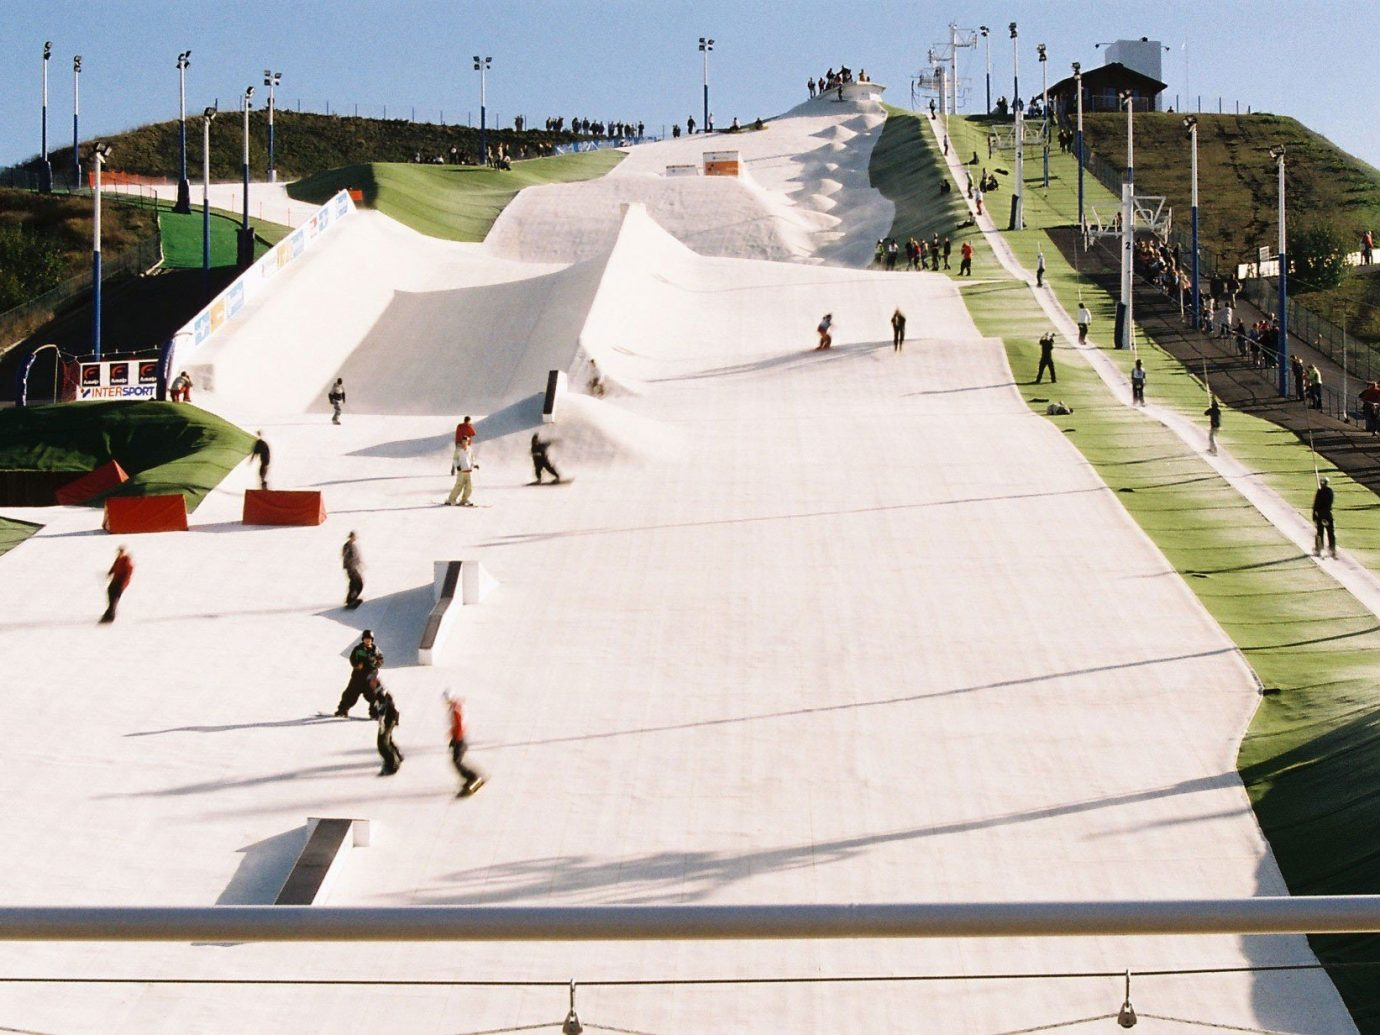 Trip Ideas sky outdoor outdoor recreation skateboarding roof